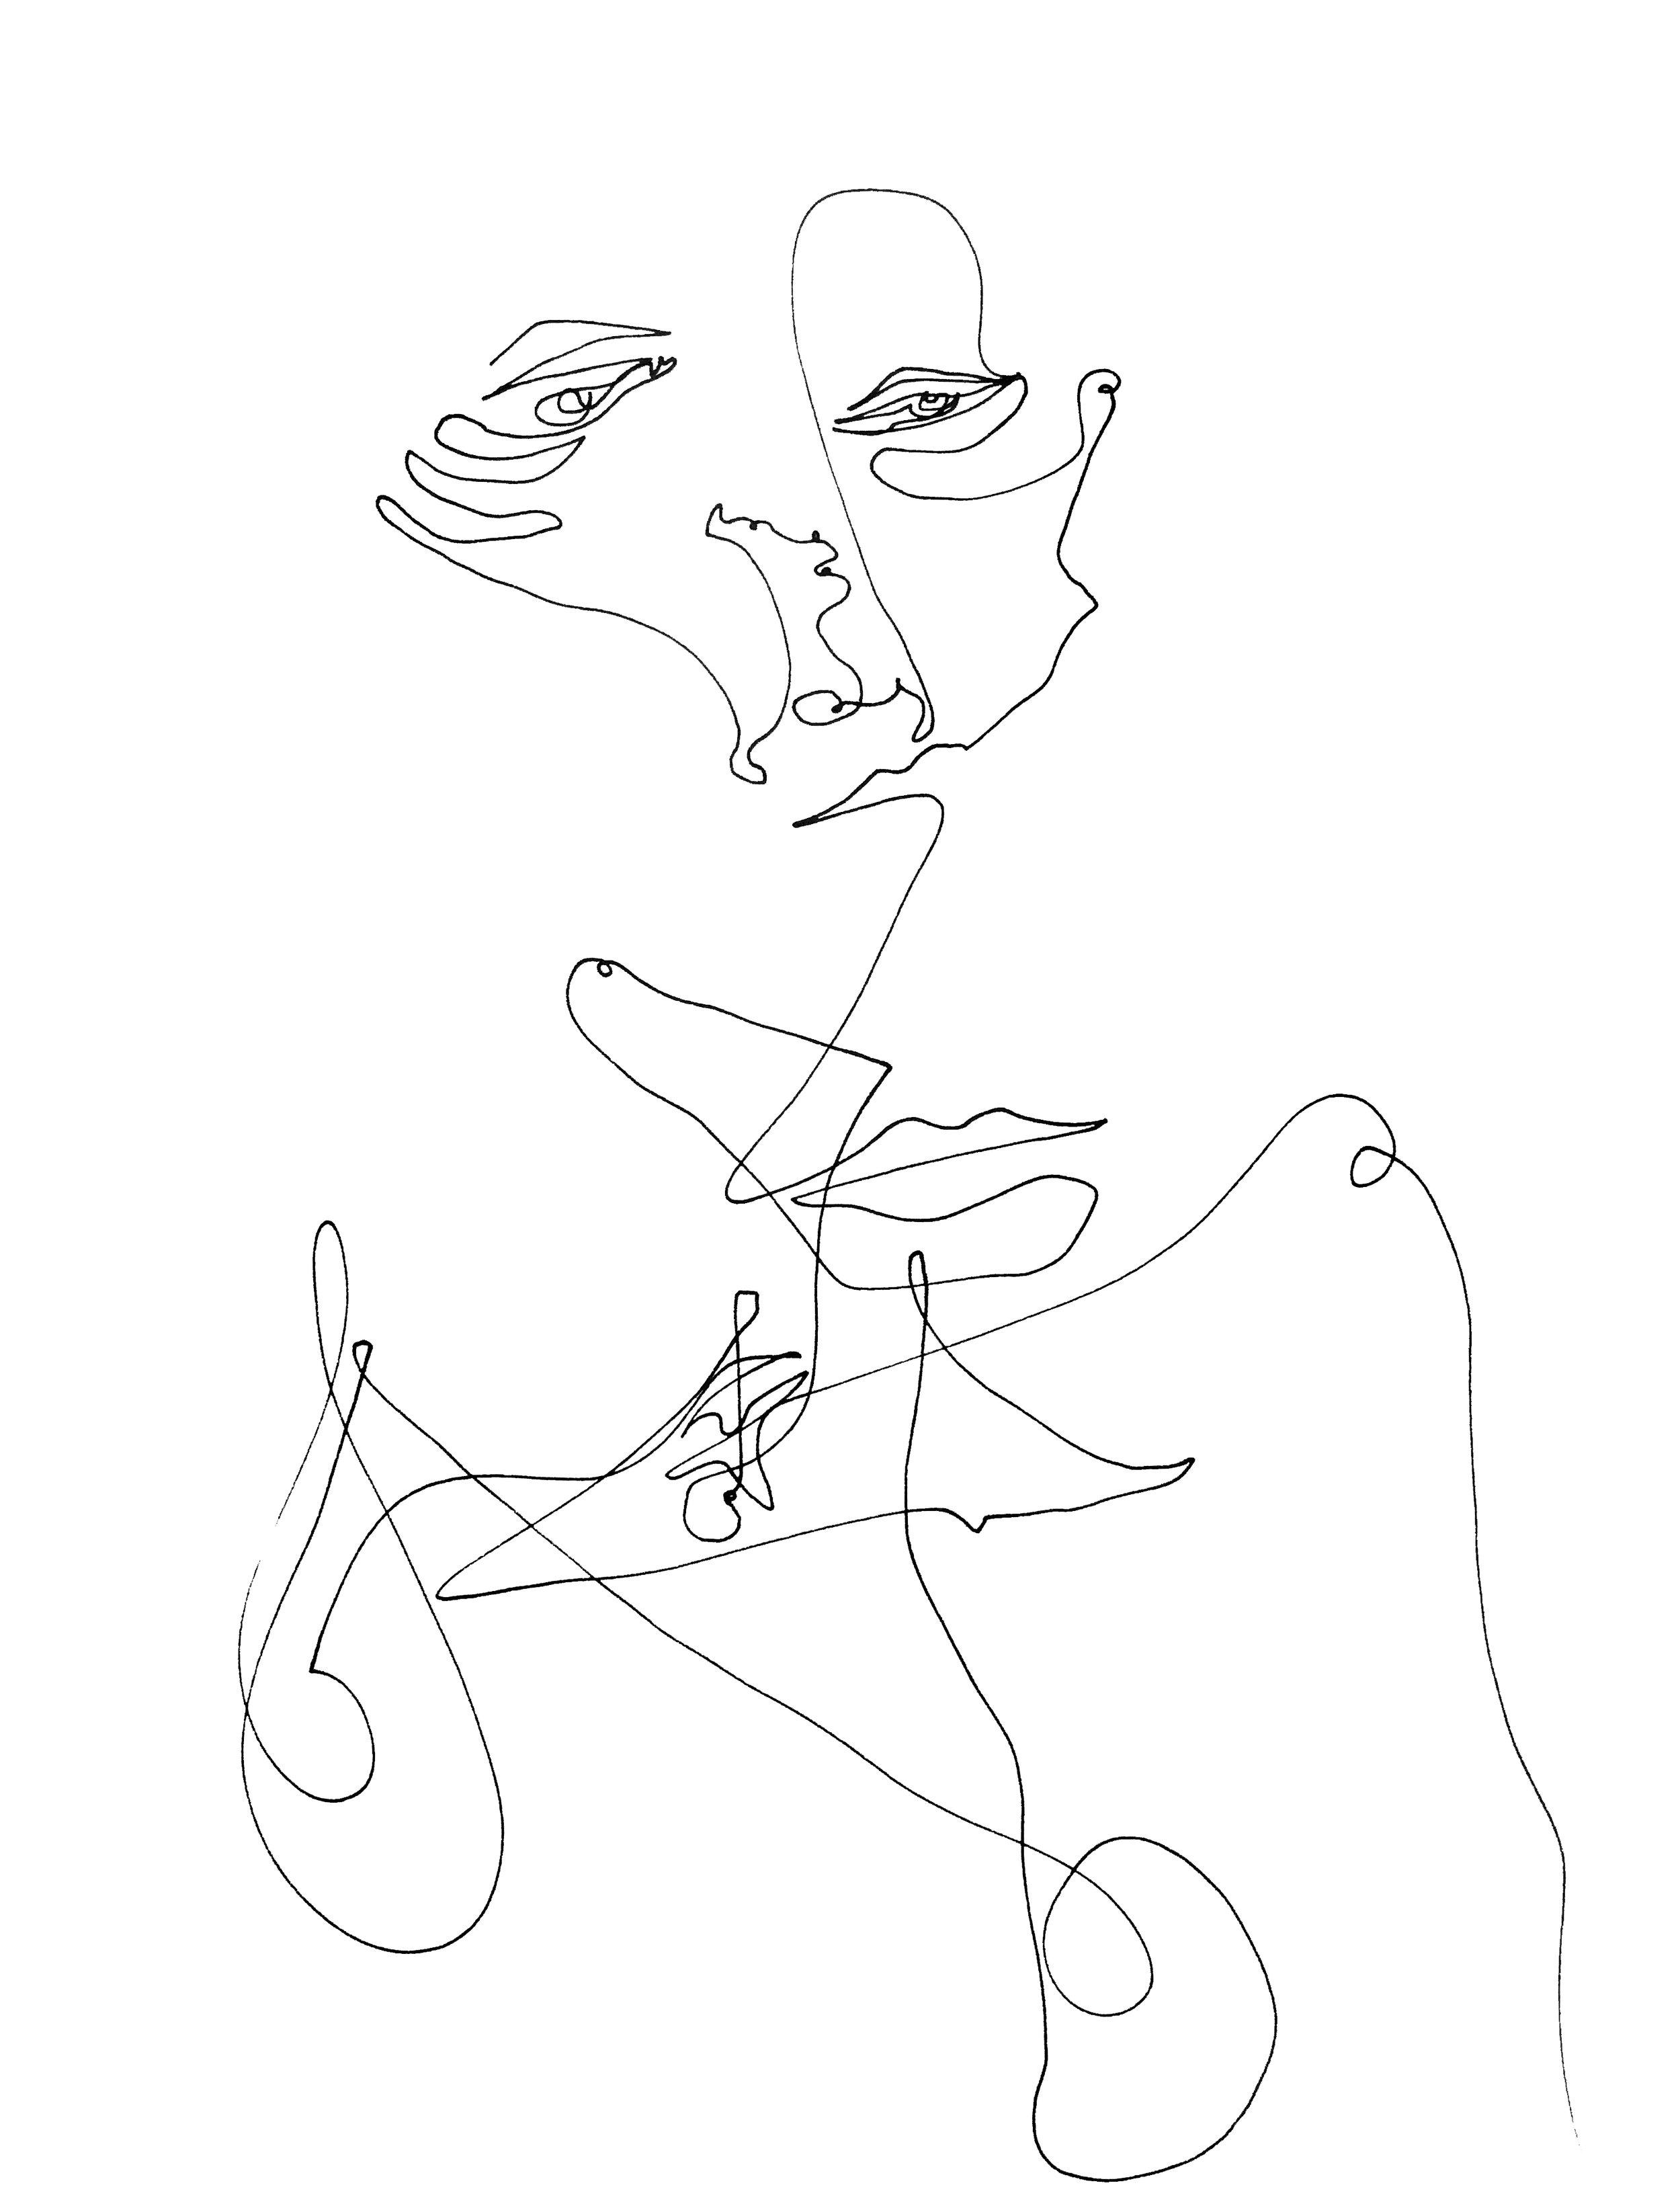 sketchi.jpg